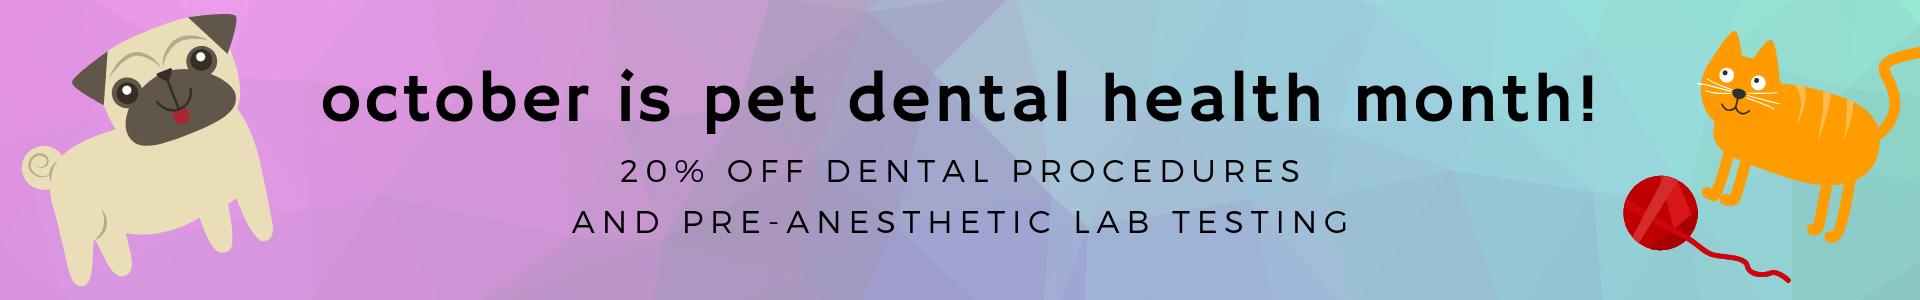 october is pet dental health month!